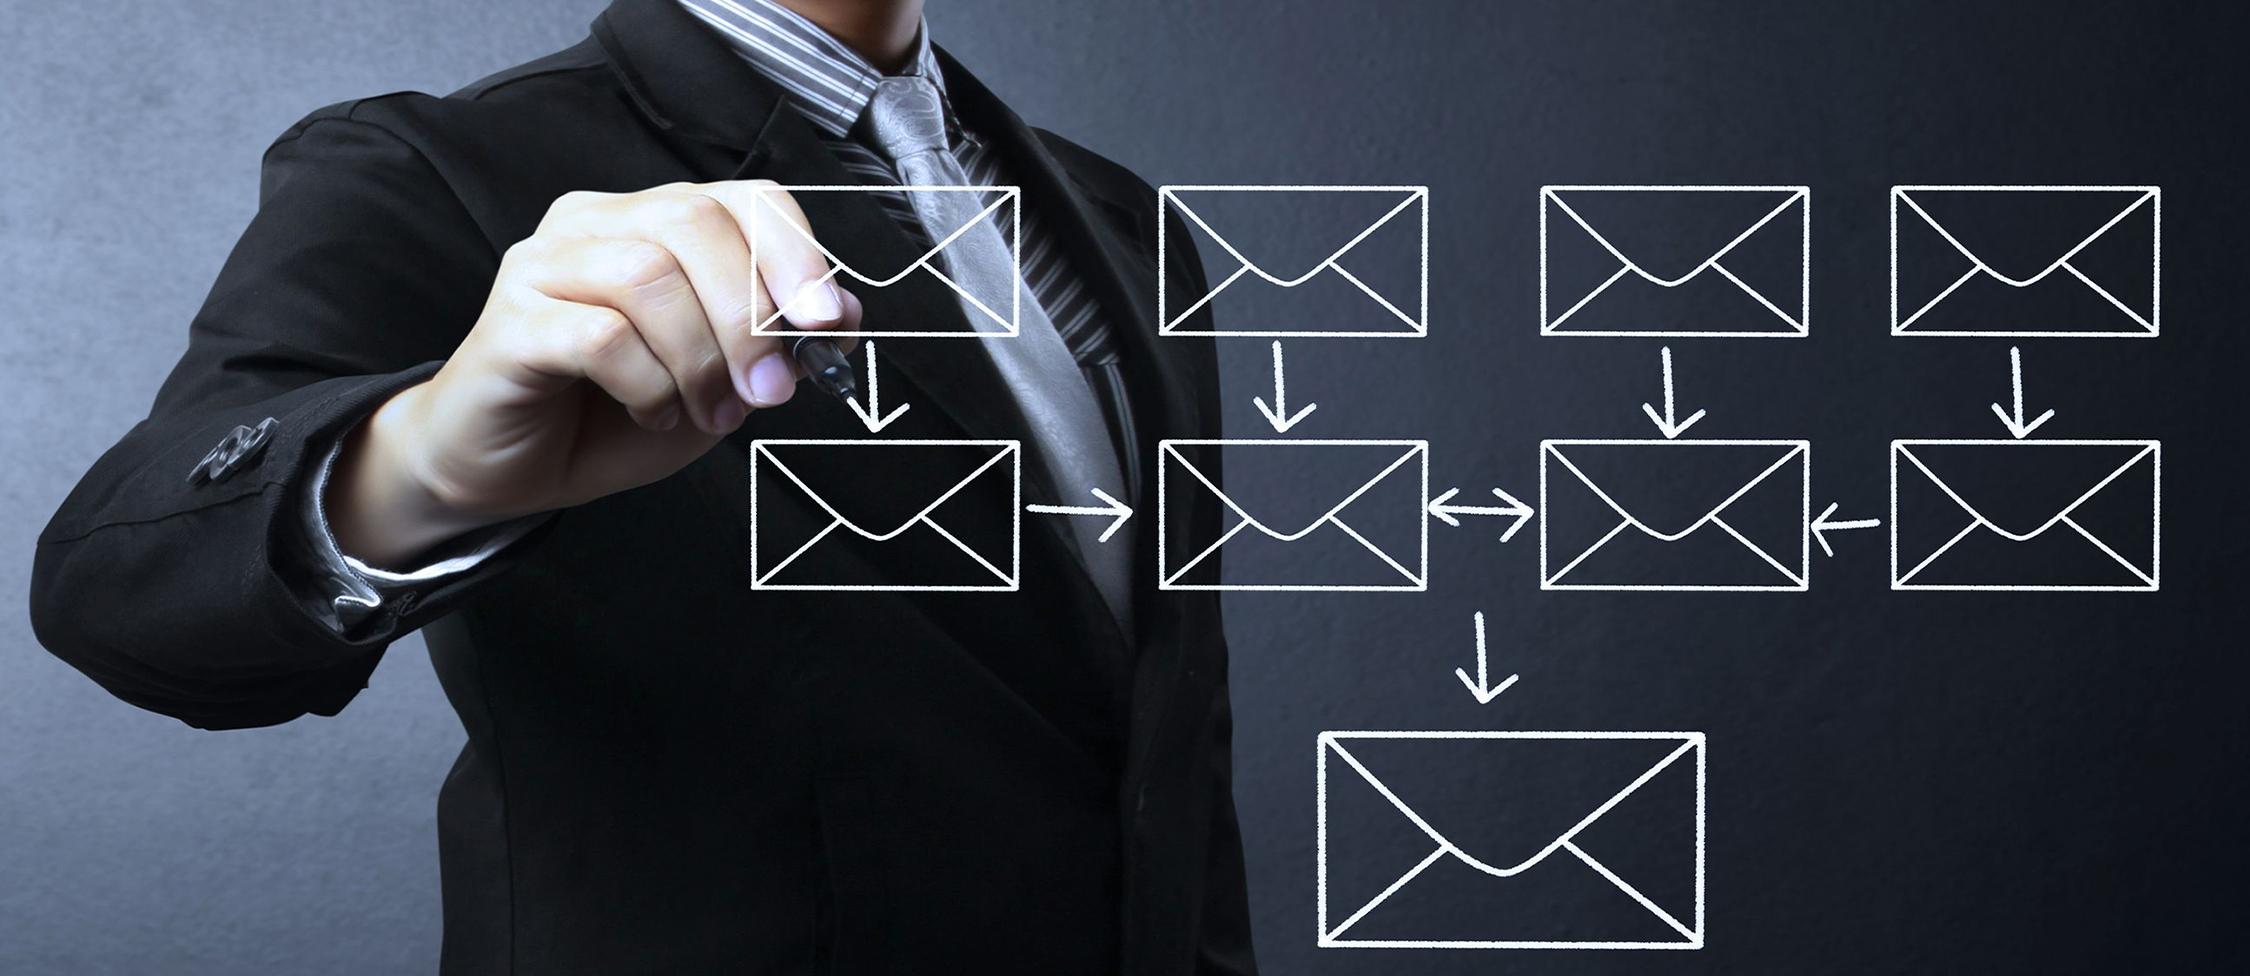 18839486 - businessman writing e-mail schema on whiteboard